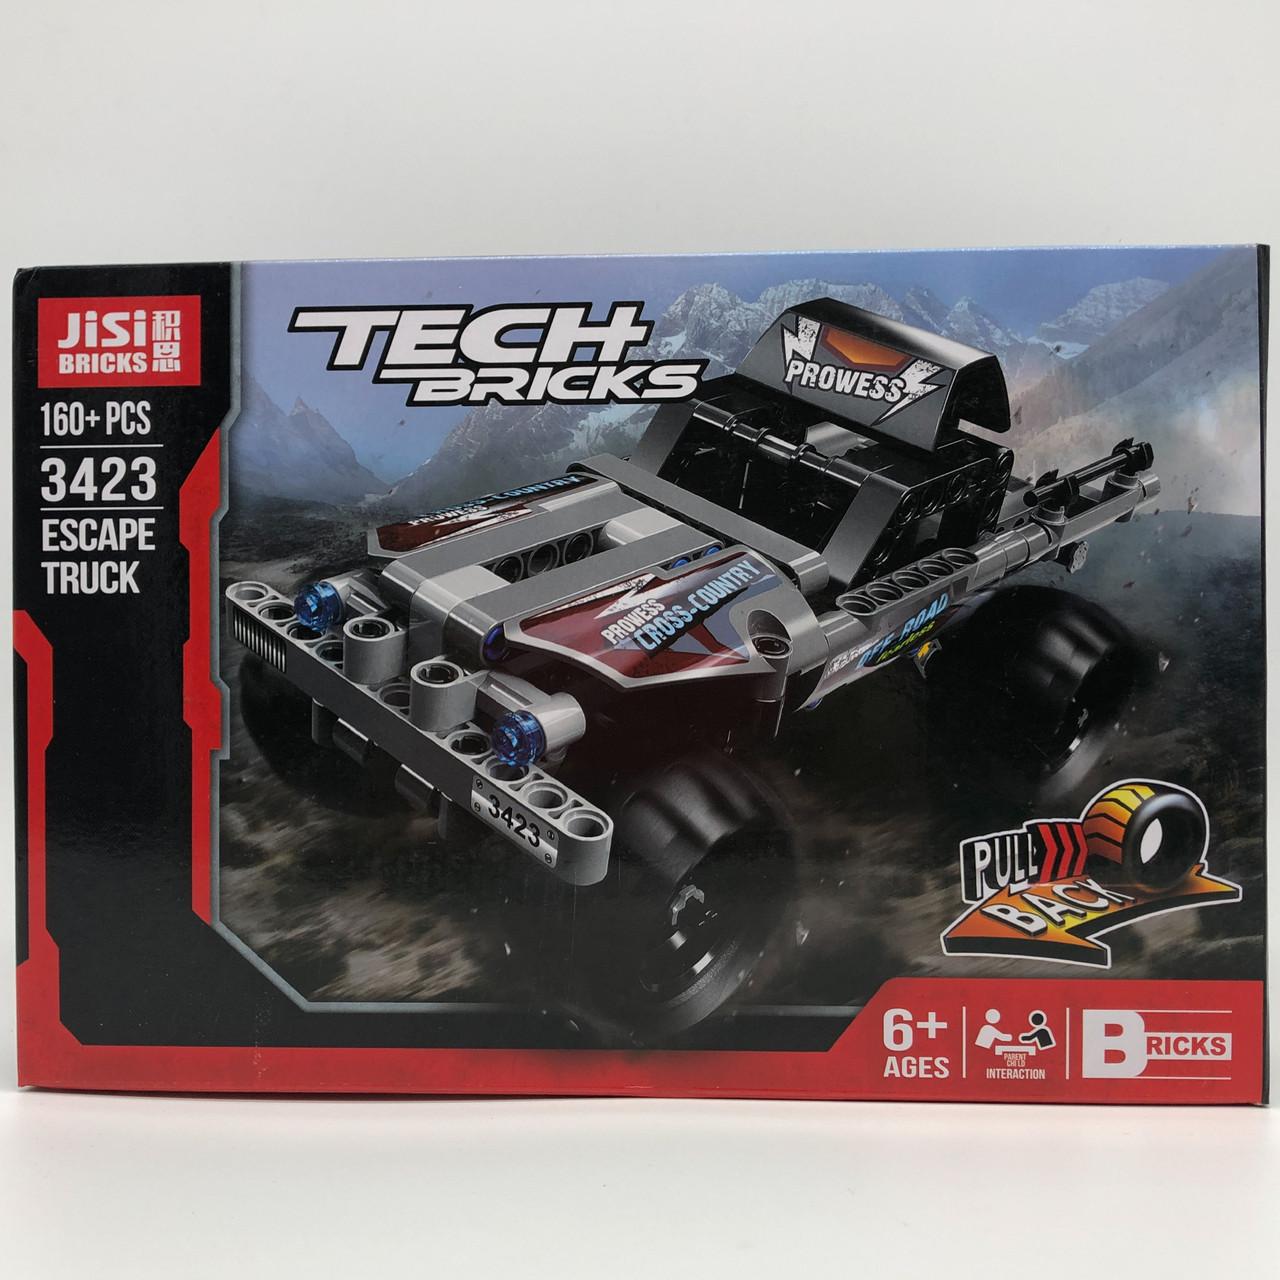 Конструктор Decool Jisi Bricks Tech Bricks 3423 160 деталей